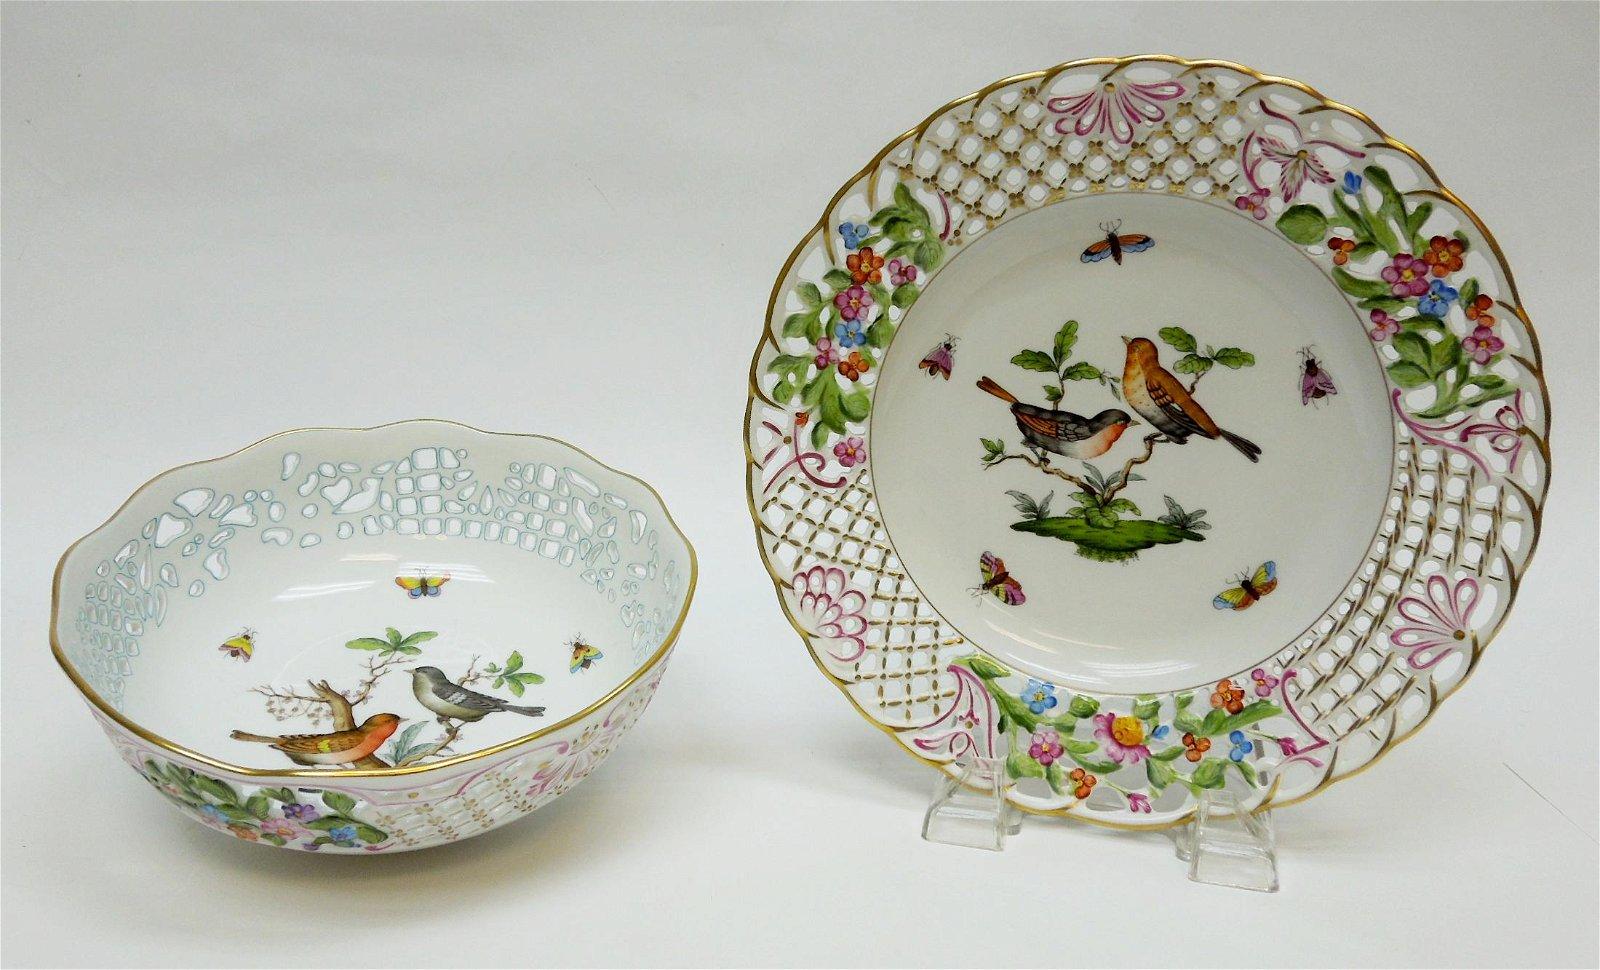 Herend Rothschild Bird Open Work  Fruit Bowl & Plate.